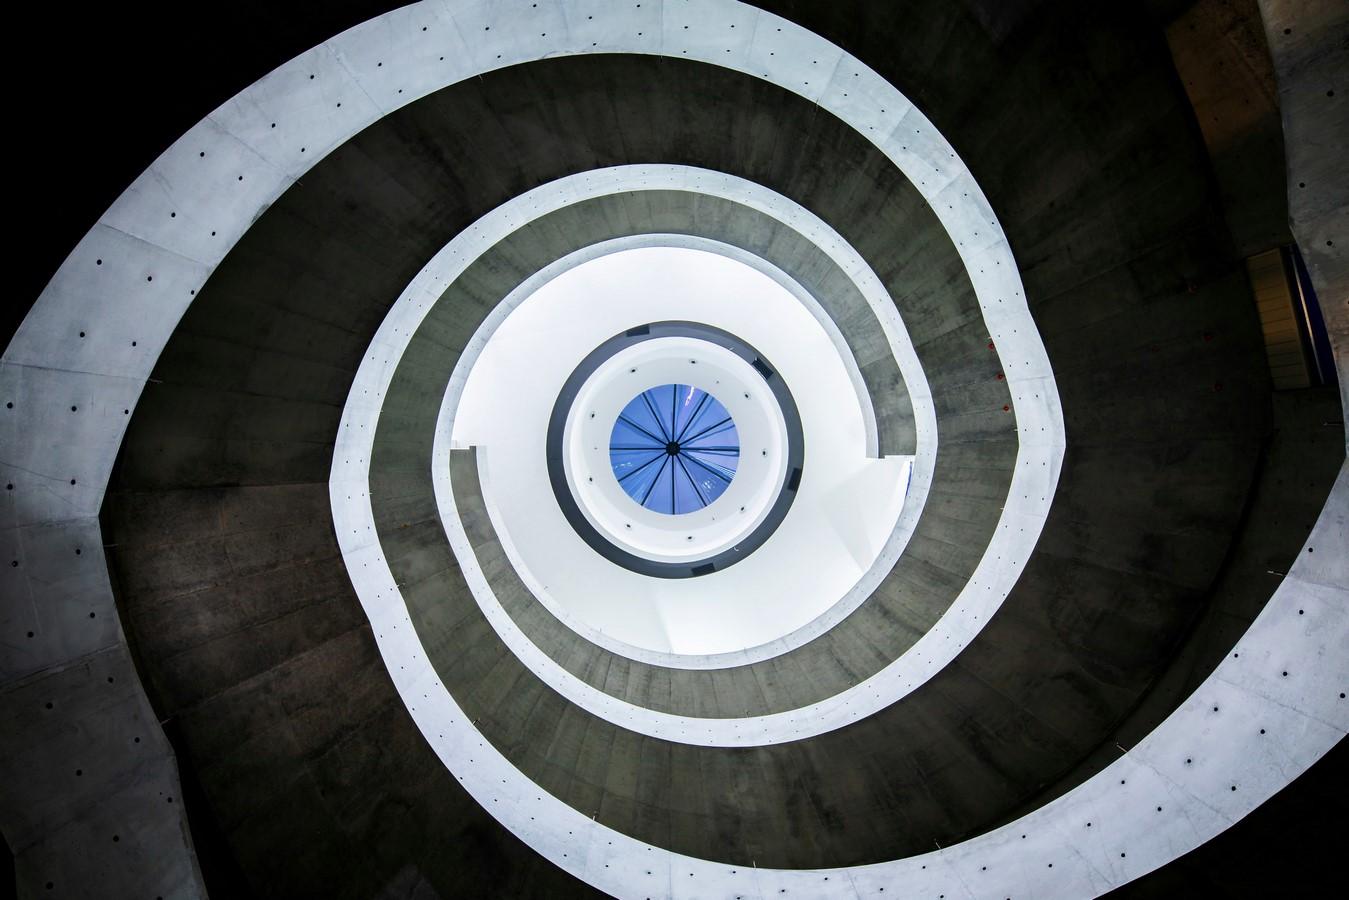 HE Art Museum by Tadao Ando: A place of harmony - Sheet3